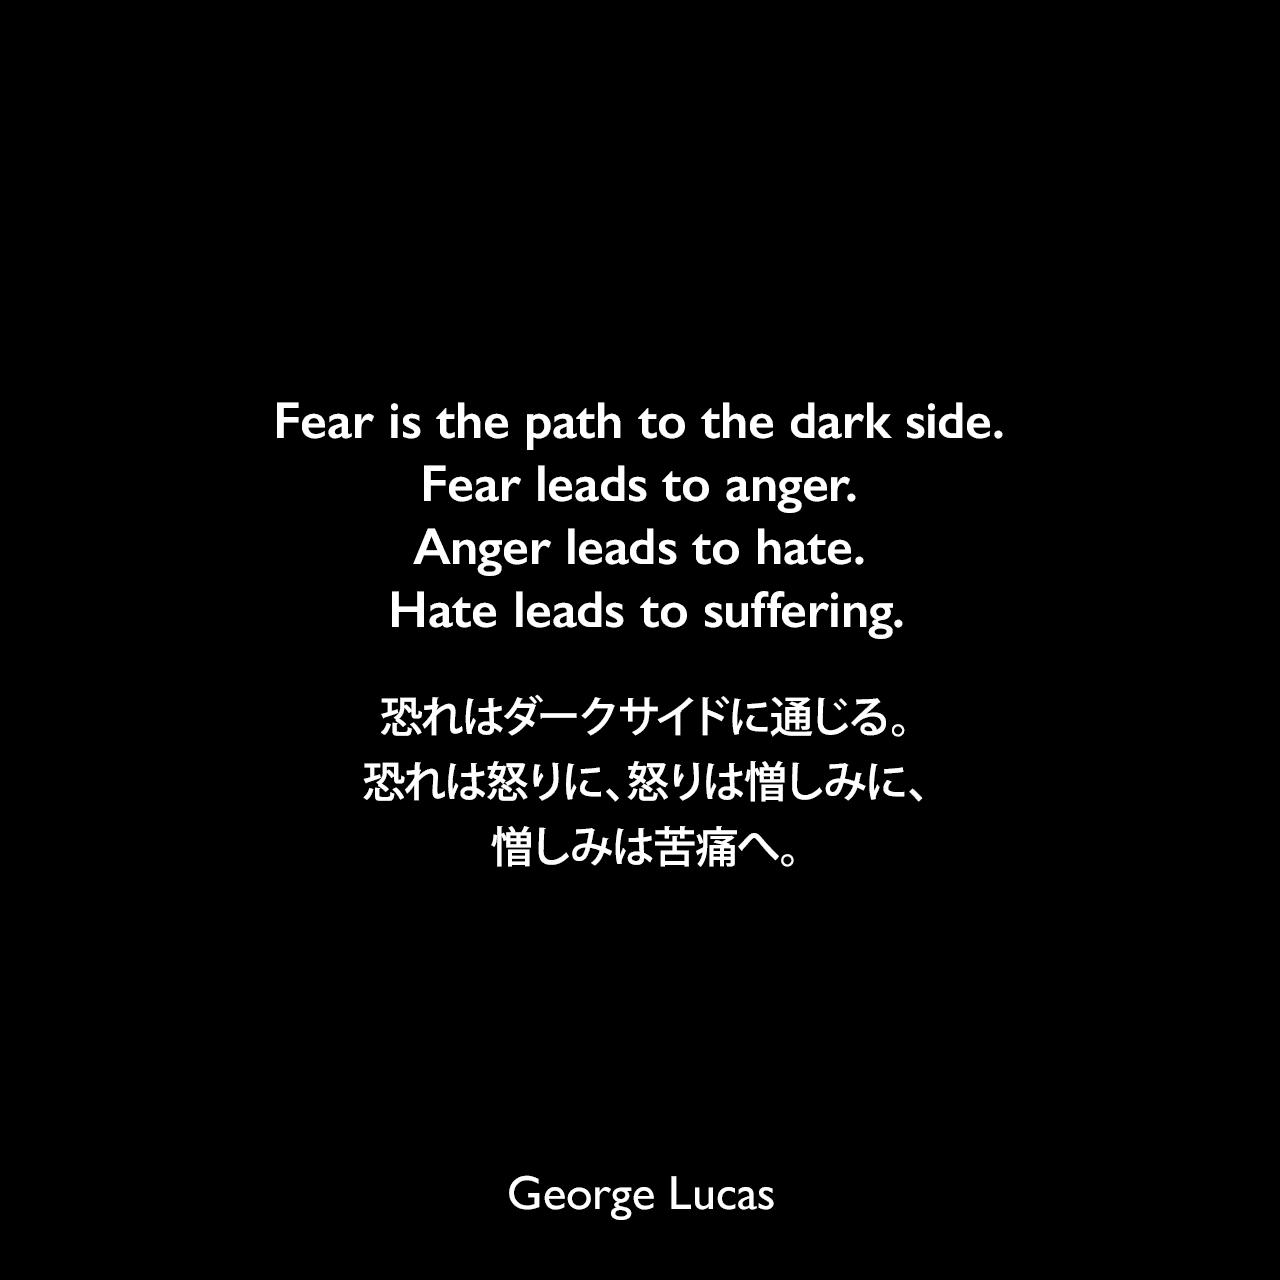 Fear is the path to the dark side. Fear leads to anger. Anger leads to hate. Hate leads to suffering.恐れはダークサイドに通じる。恐れは怒りに、怒りは憎しみに、憎しみは苦痛へ。- ヨーダがアナキンに言った言葉(Star Wars: Episode I - The Phantom Menace ファントム・メナス)よりGeorge Lucas